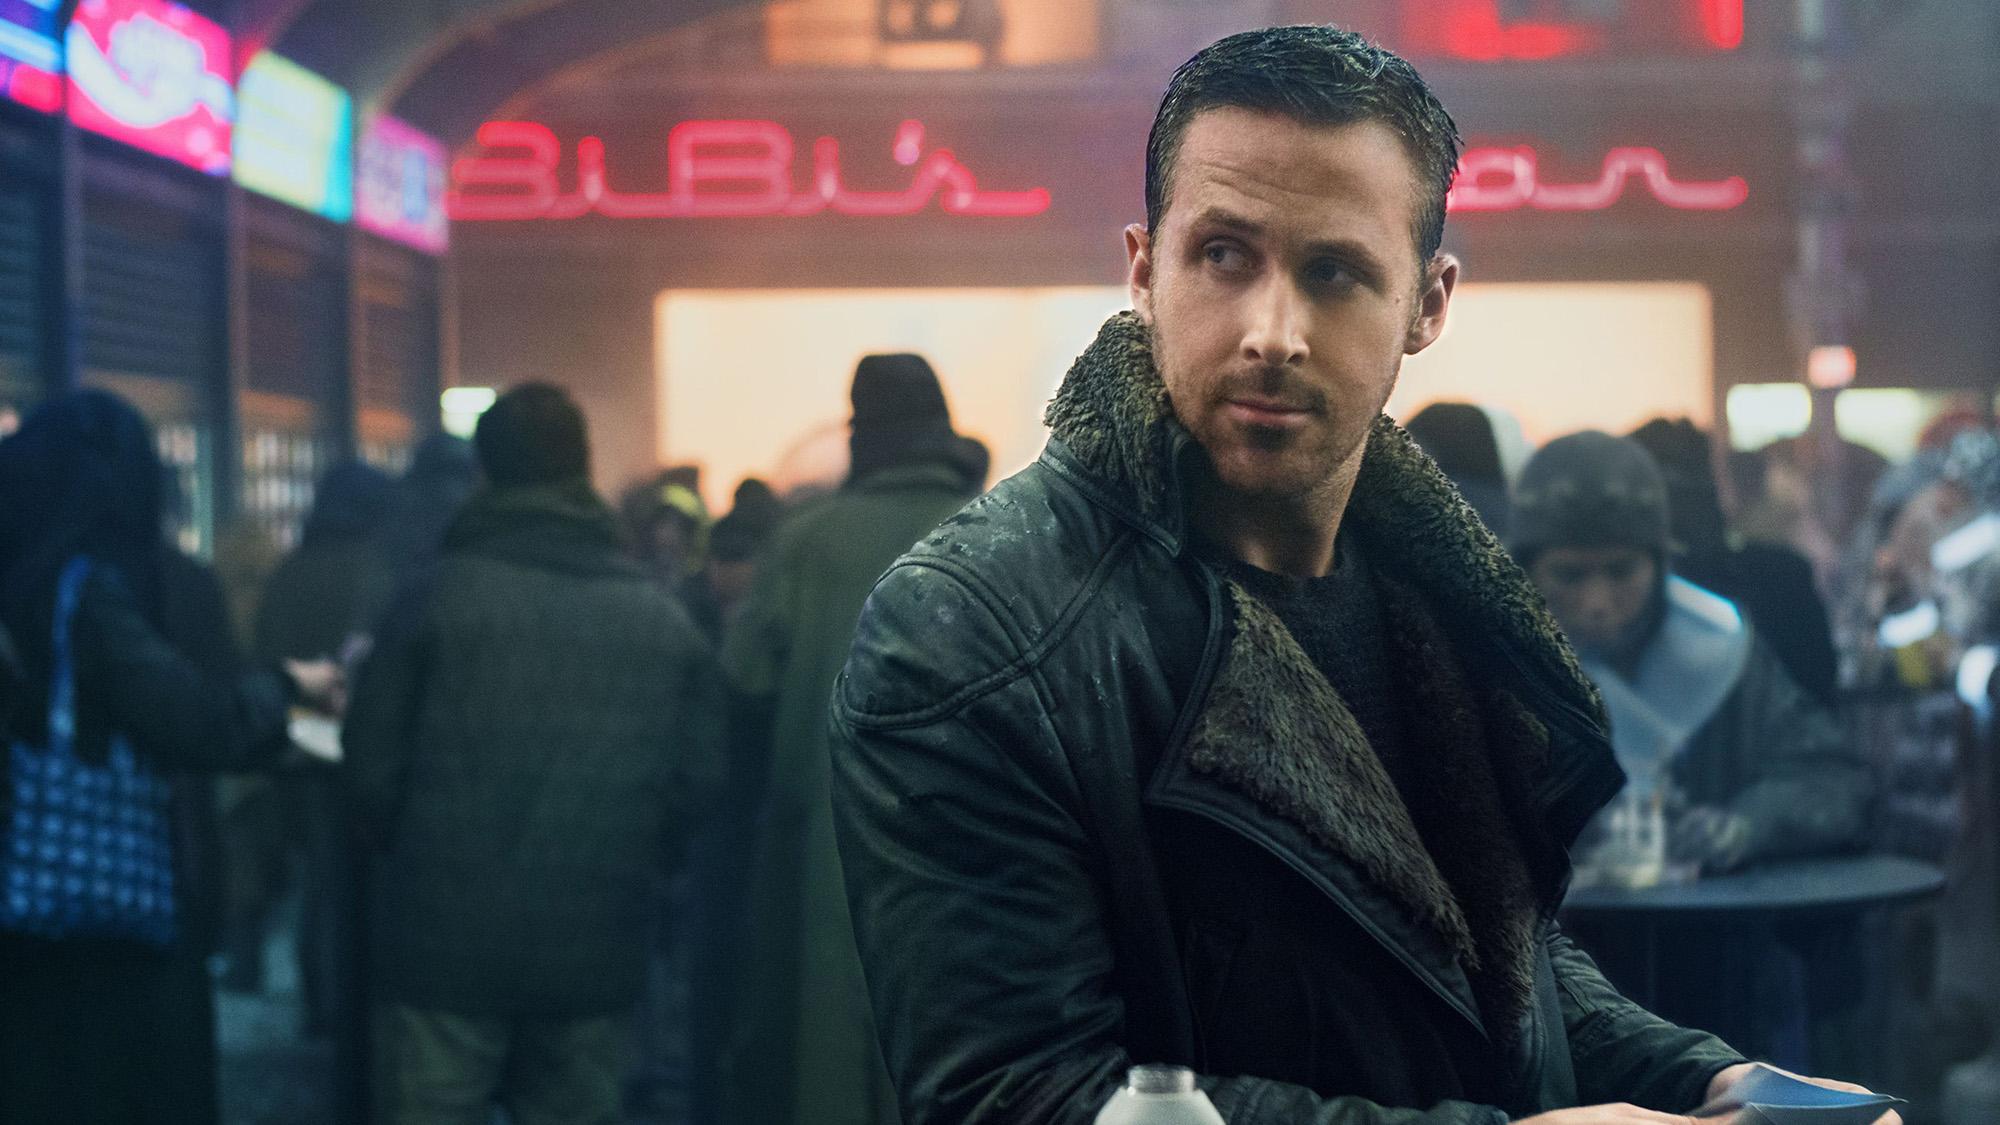 Ryan Gosling in 'Blade Runner: 2049'. (Pic: Warner Bros)